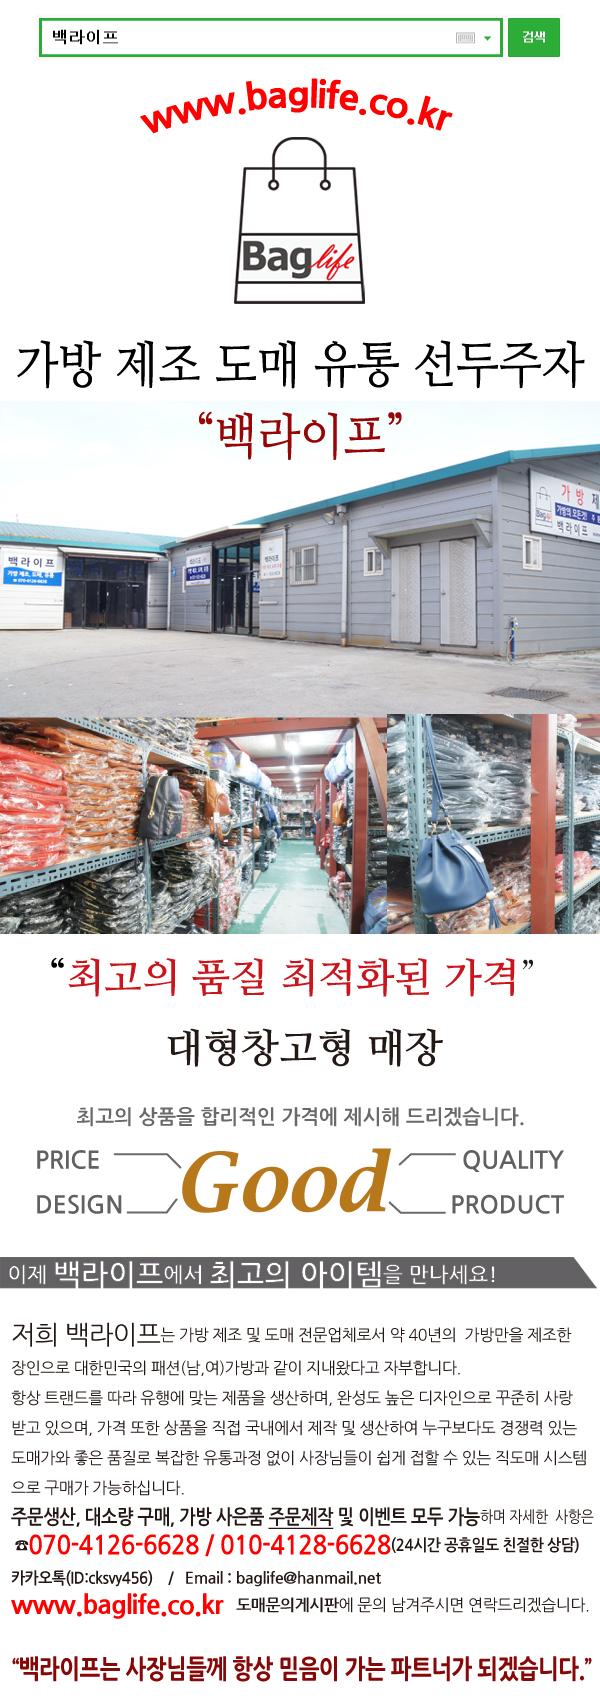 http://www.ggalse.co.kr/data/image/gwango/baglife_wongo10.jpg